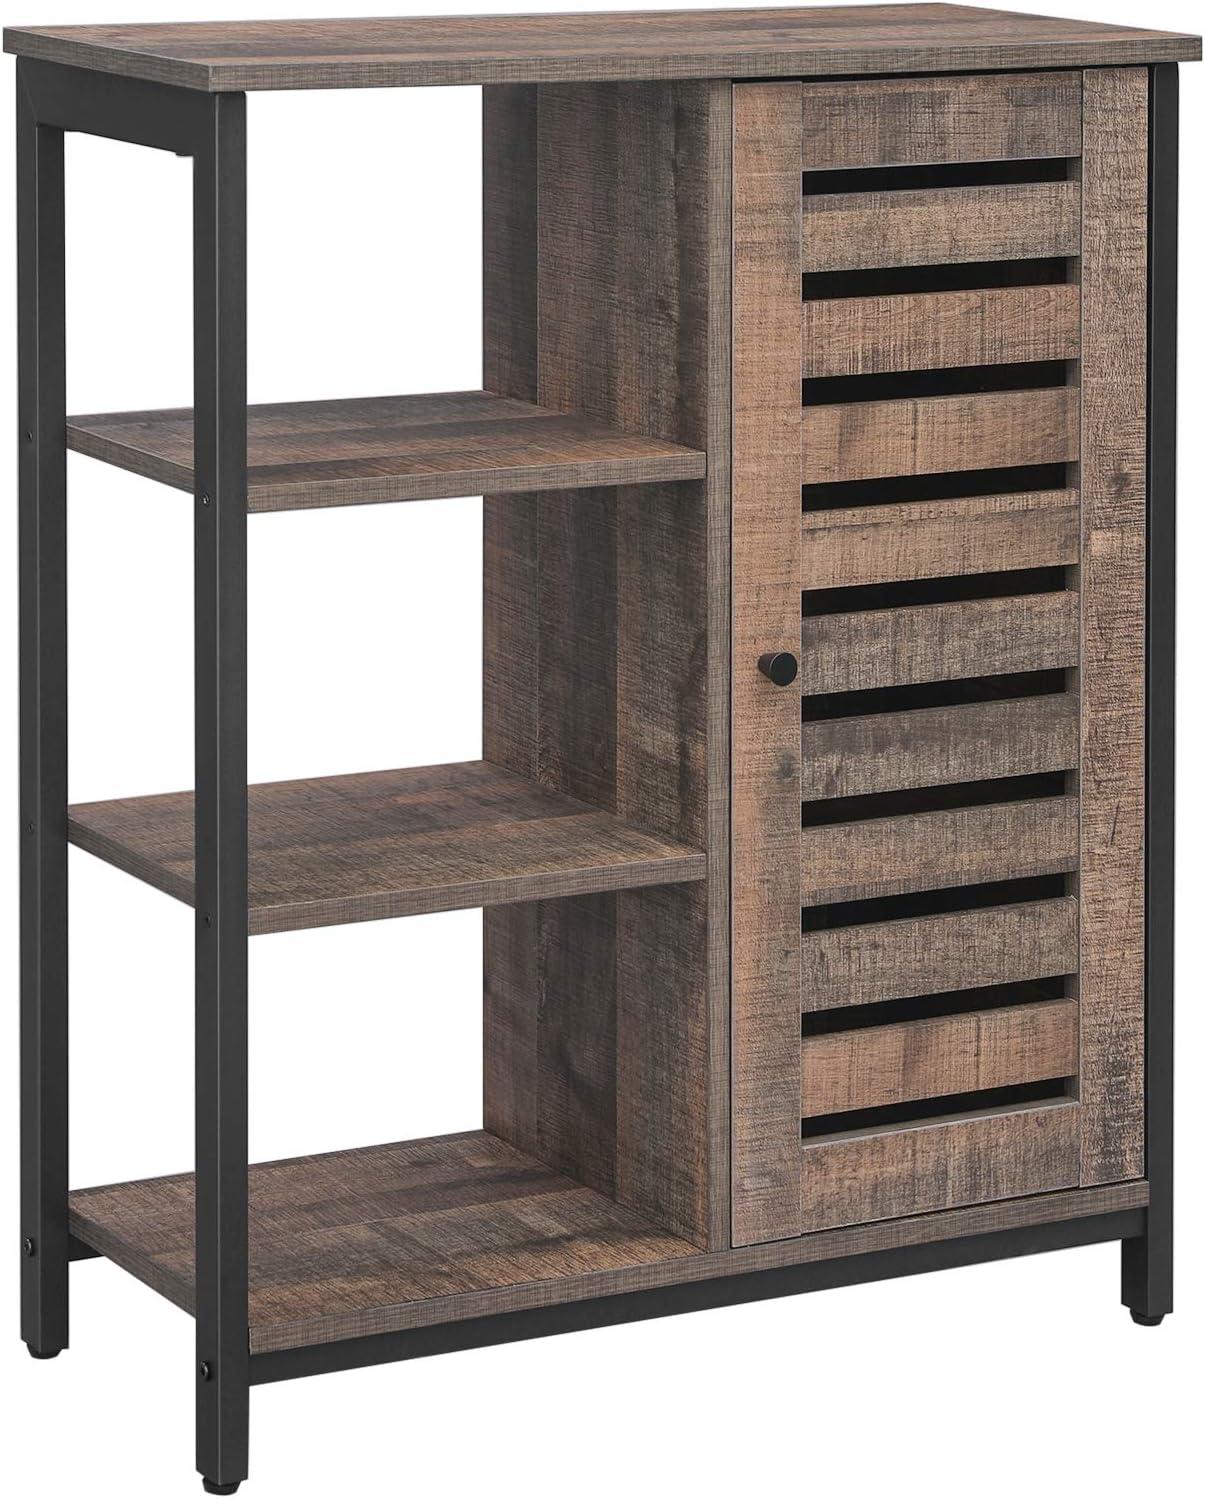 "VASAGLE Storage Cabinet, 27.6"" W, Cool Rustic Brown"